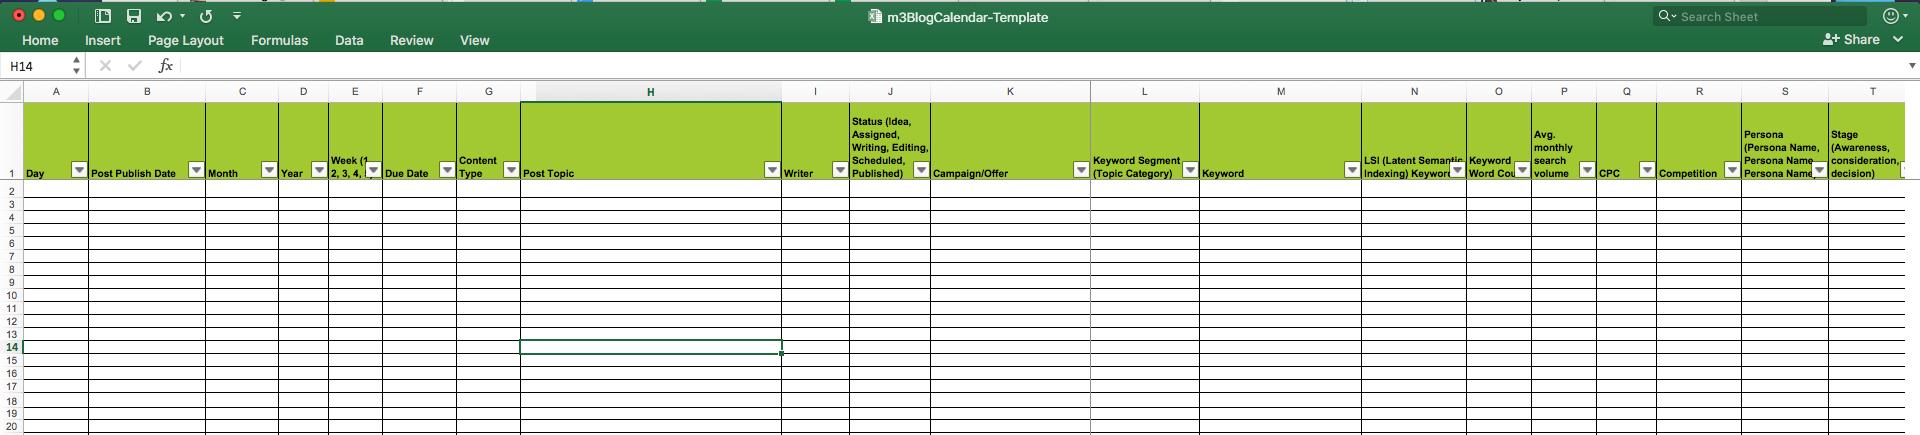 Excel Calendar Spreadsheet Regarding Editorial Calendar Templates For Content Marketing: The Ultimate List